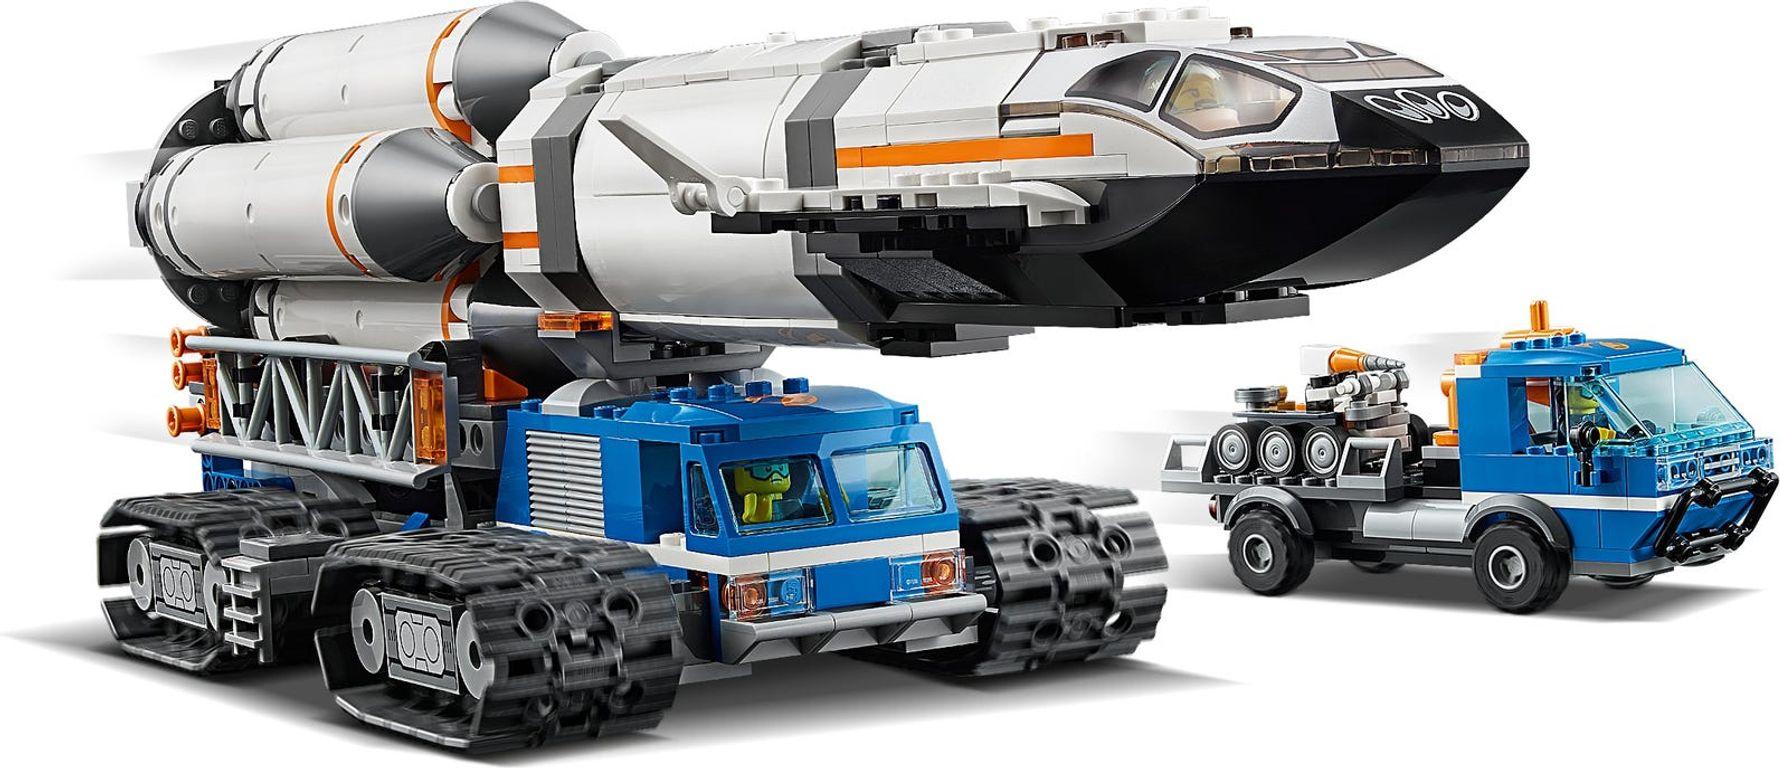 Rocket Assembly & Transport gameplay